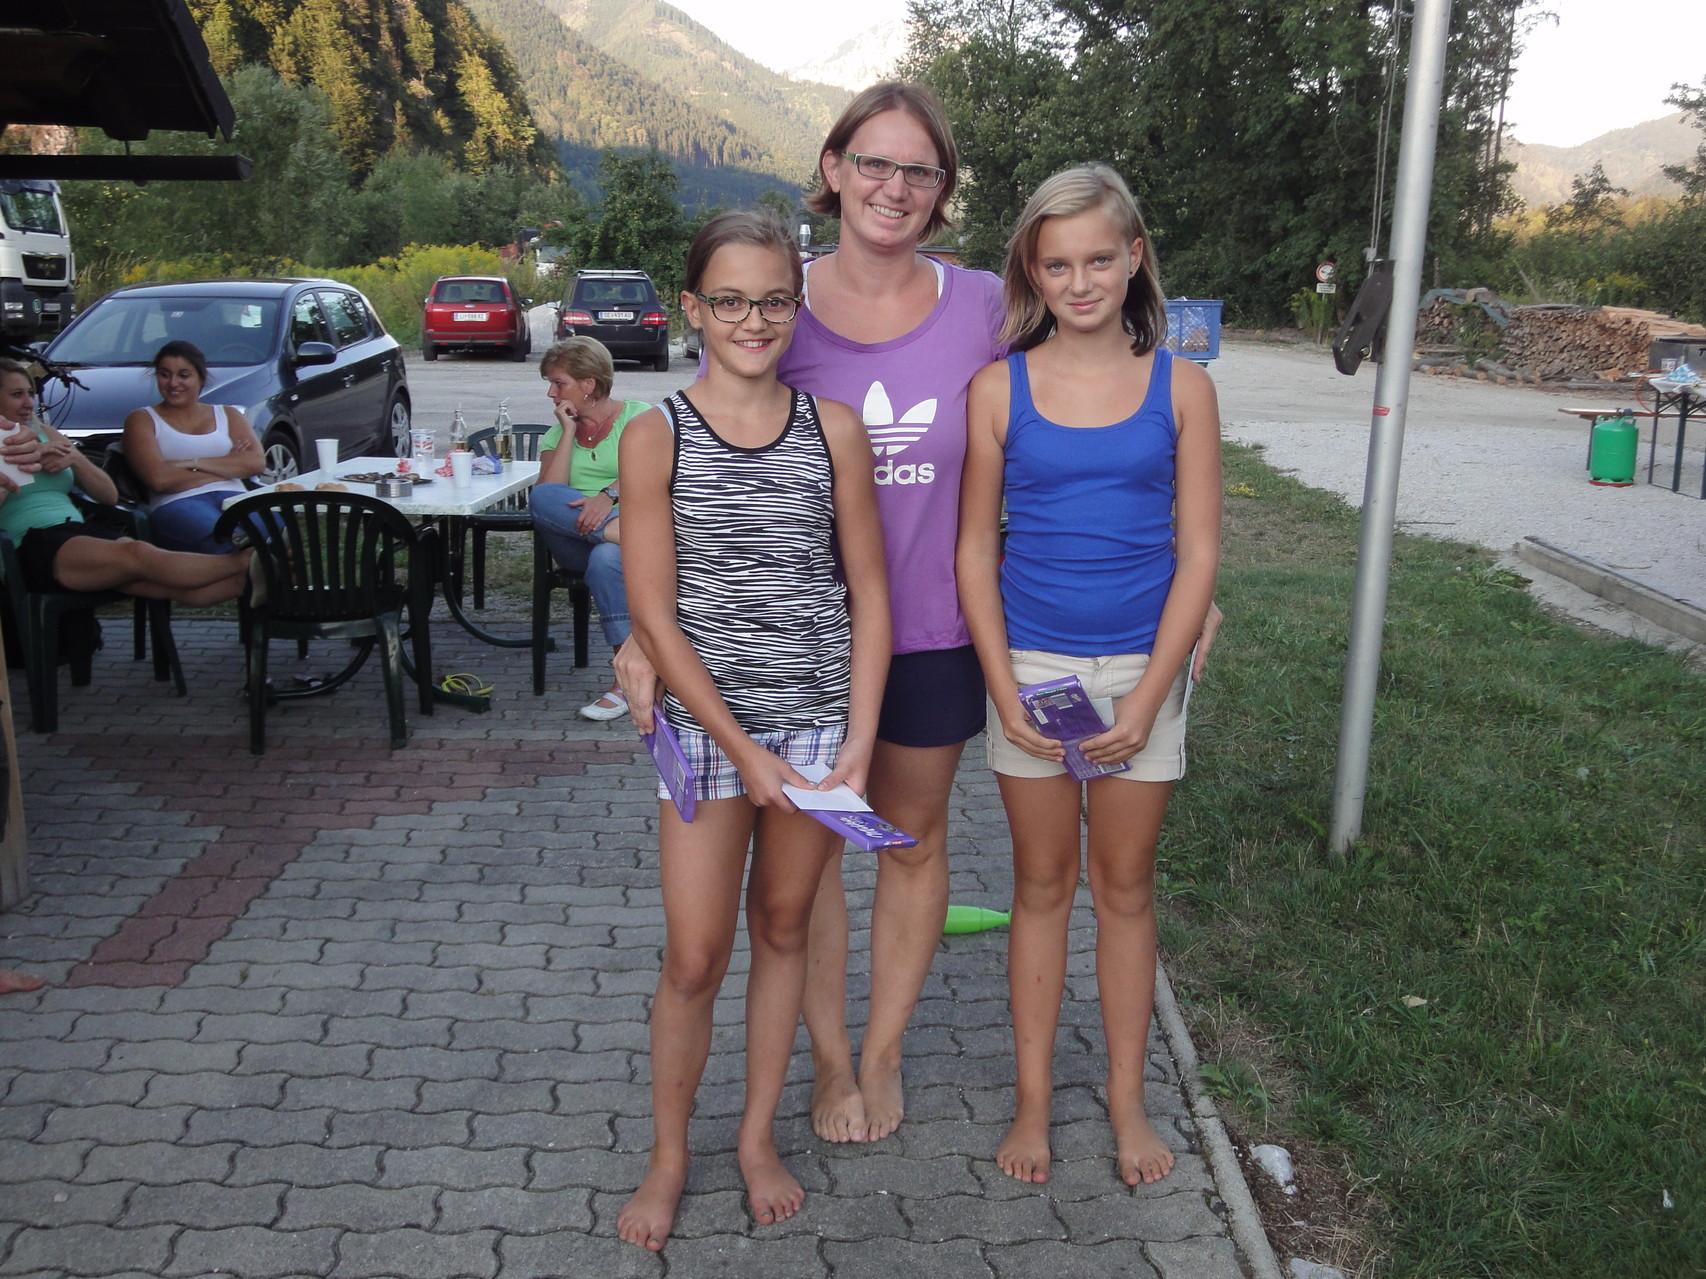 Team Karo, Marion, Laura